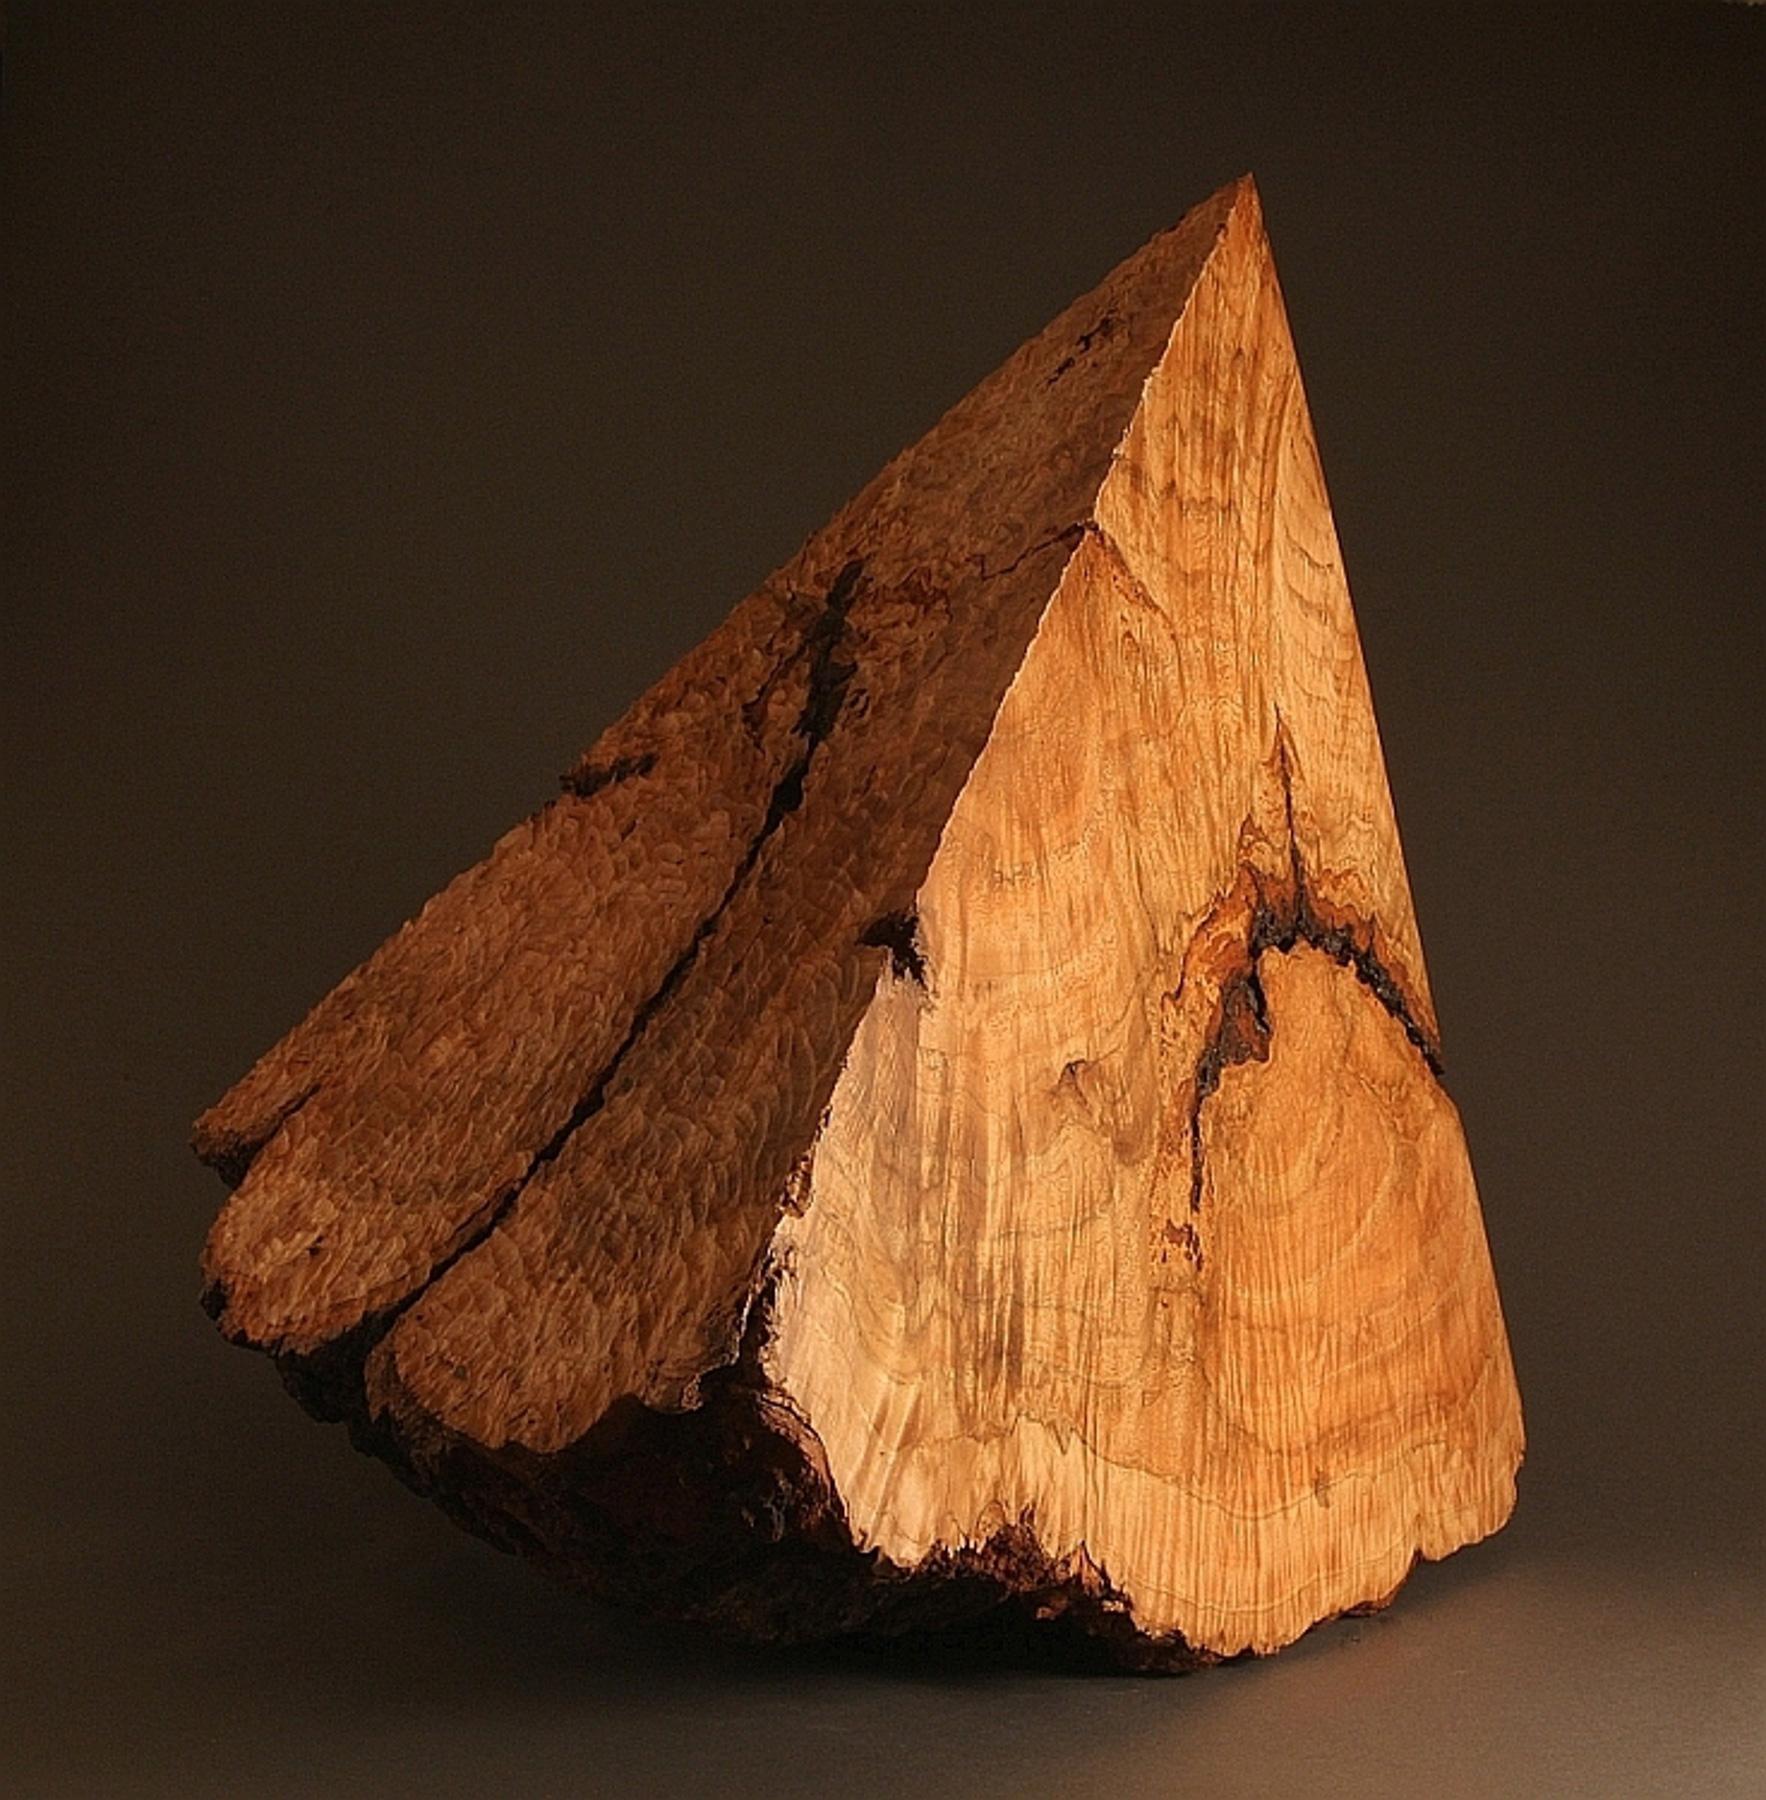 Tetrahedron (Presentations Four)